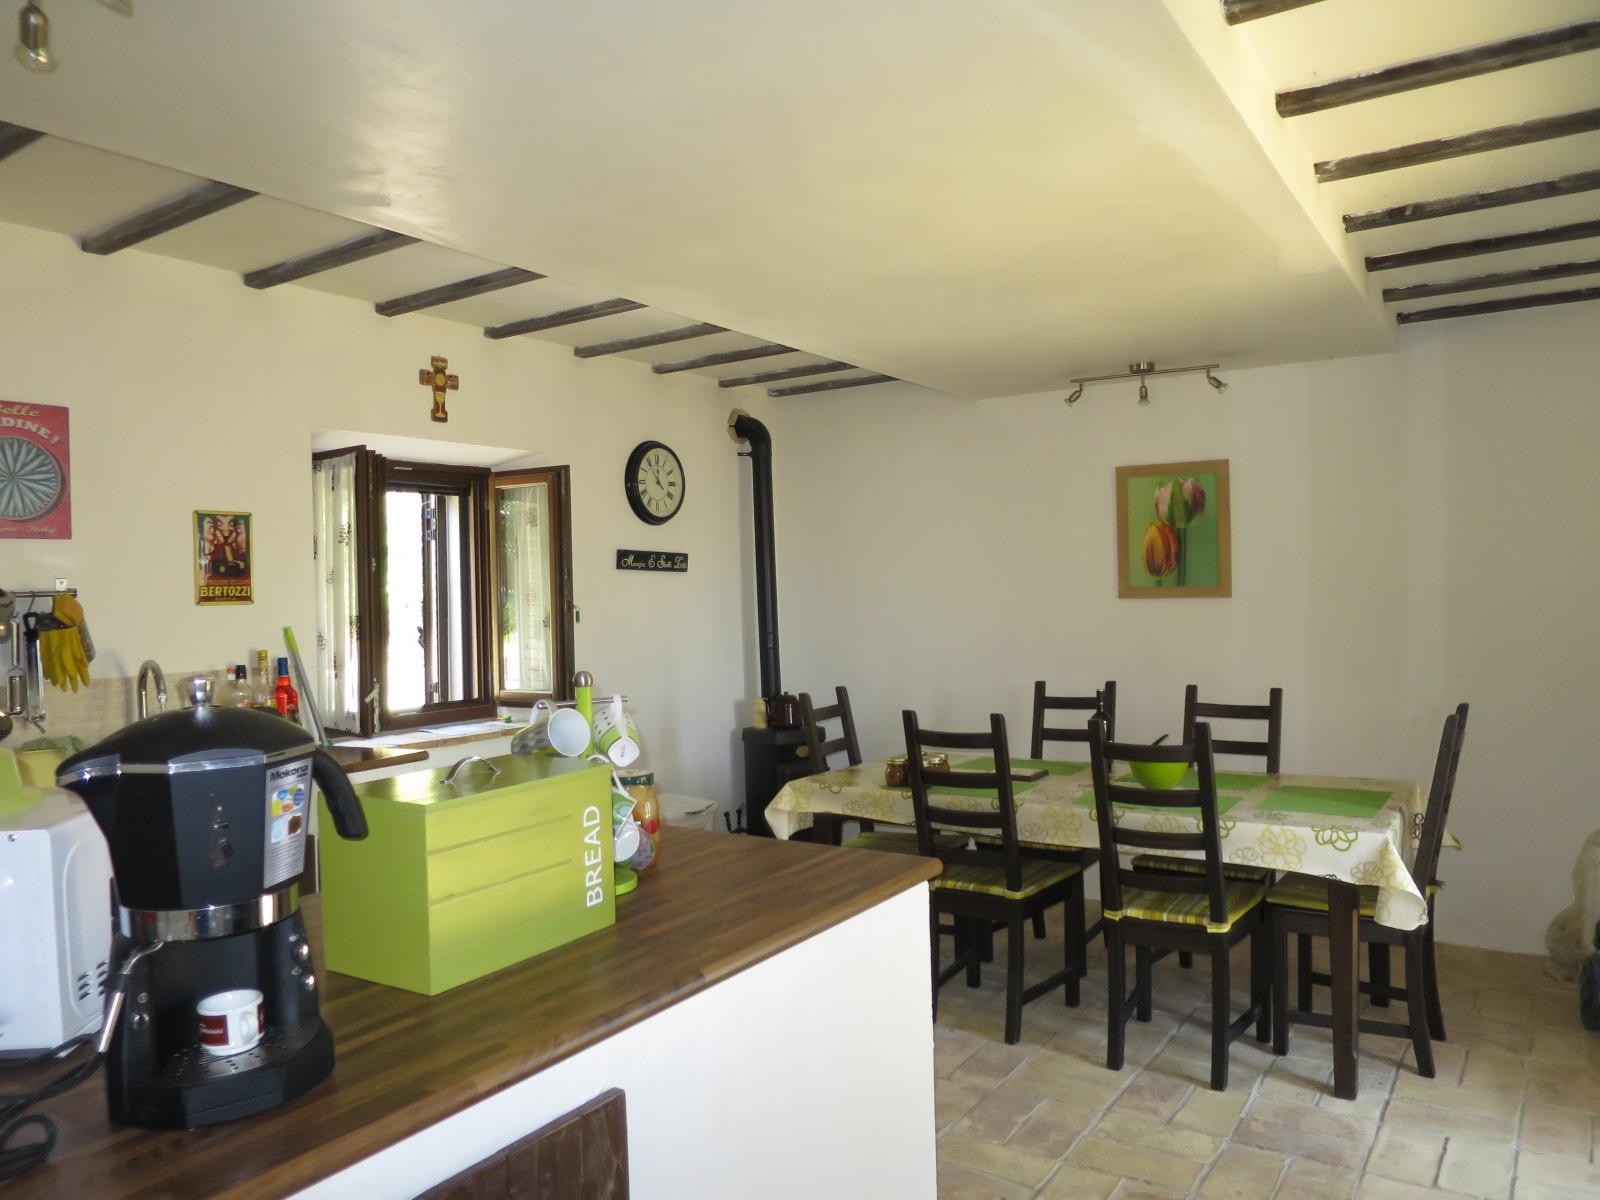 Country Houses Country Houses for sale Montefino (TE), Casa Collina - Montefino - EUR 151.447 300